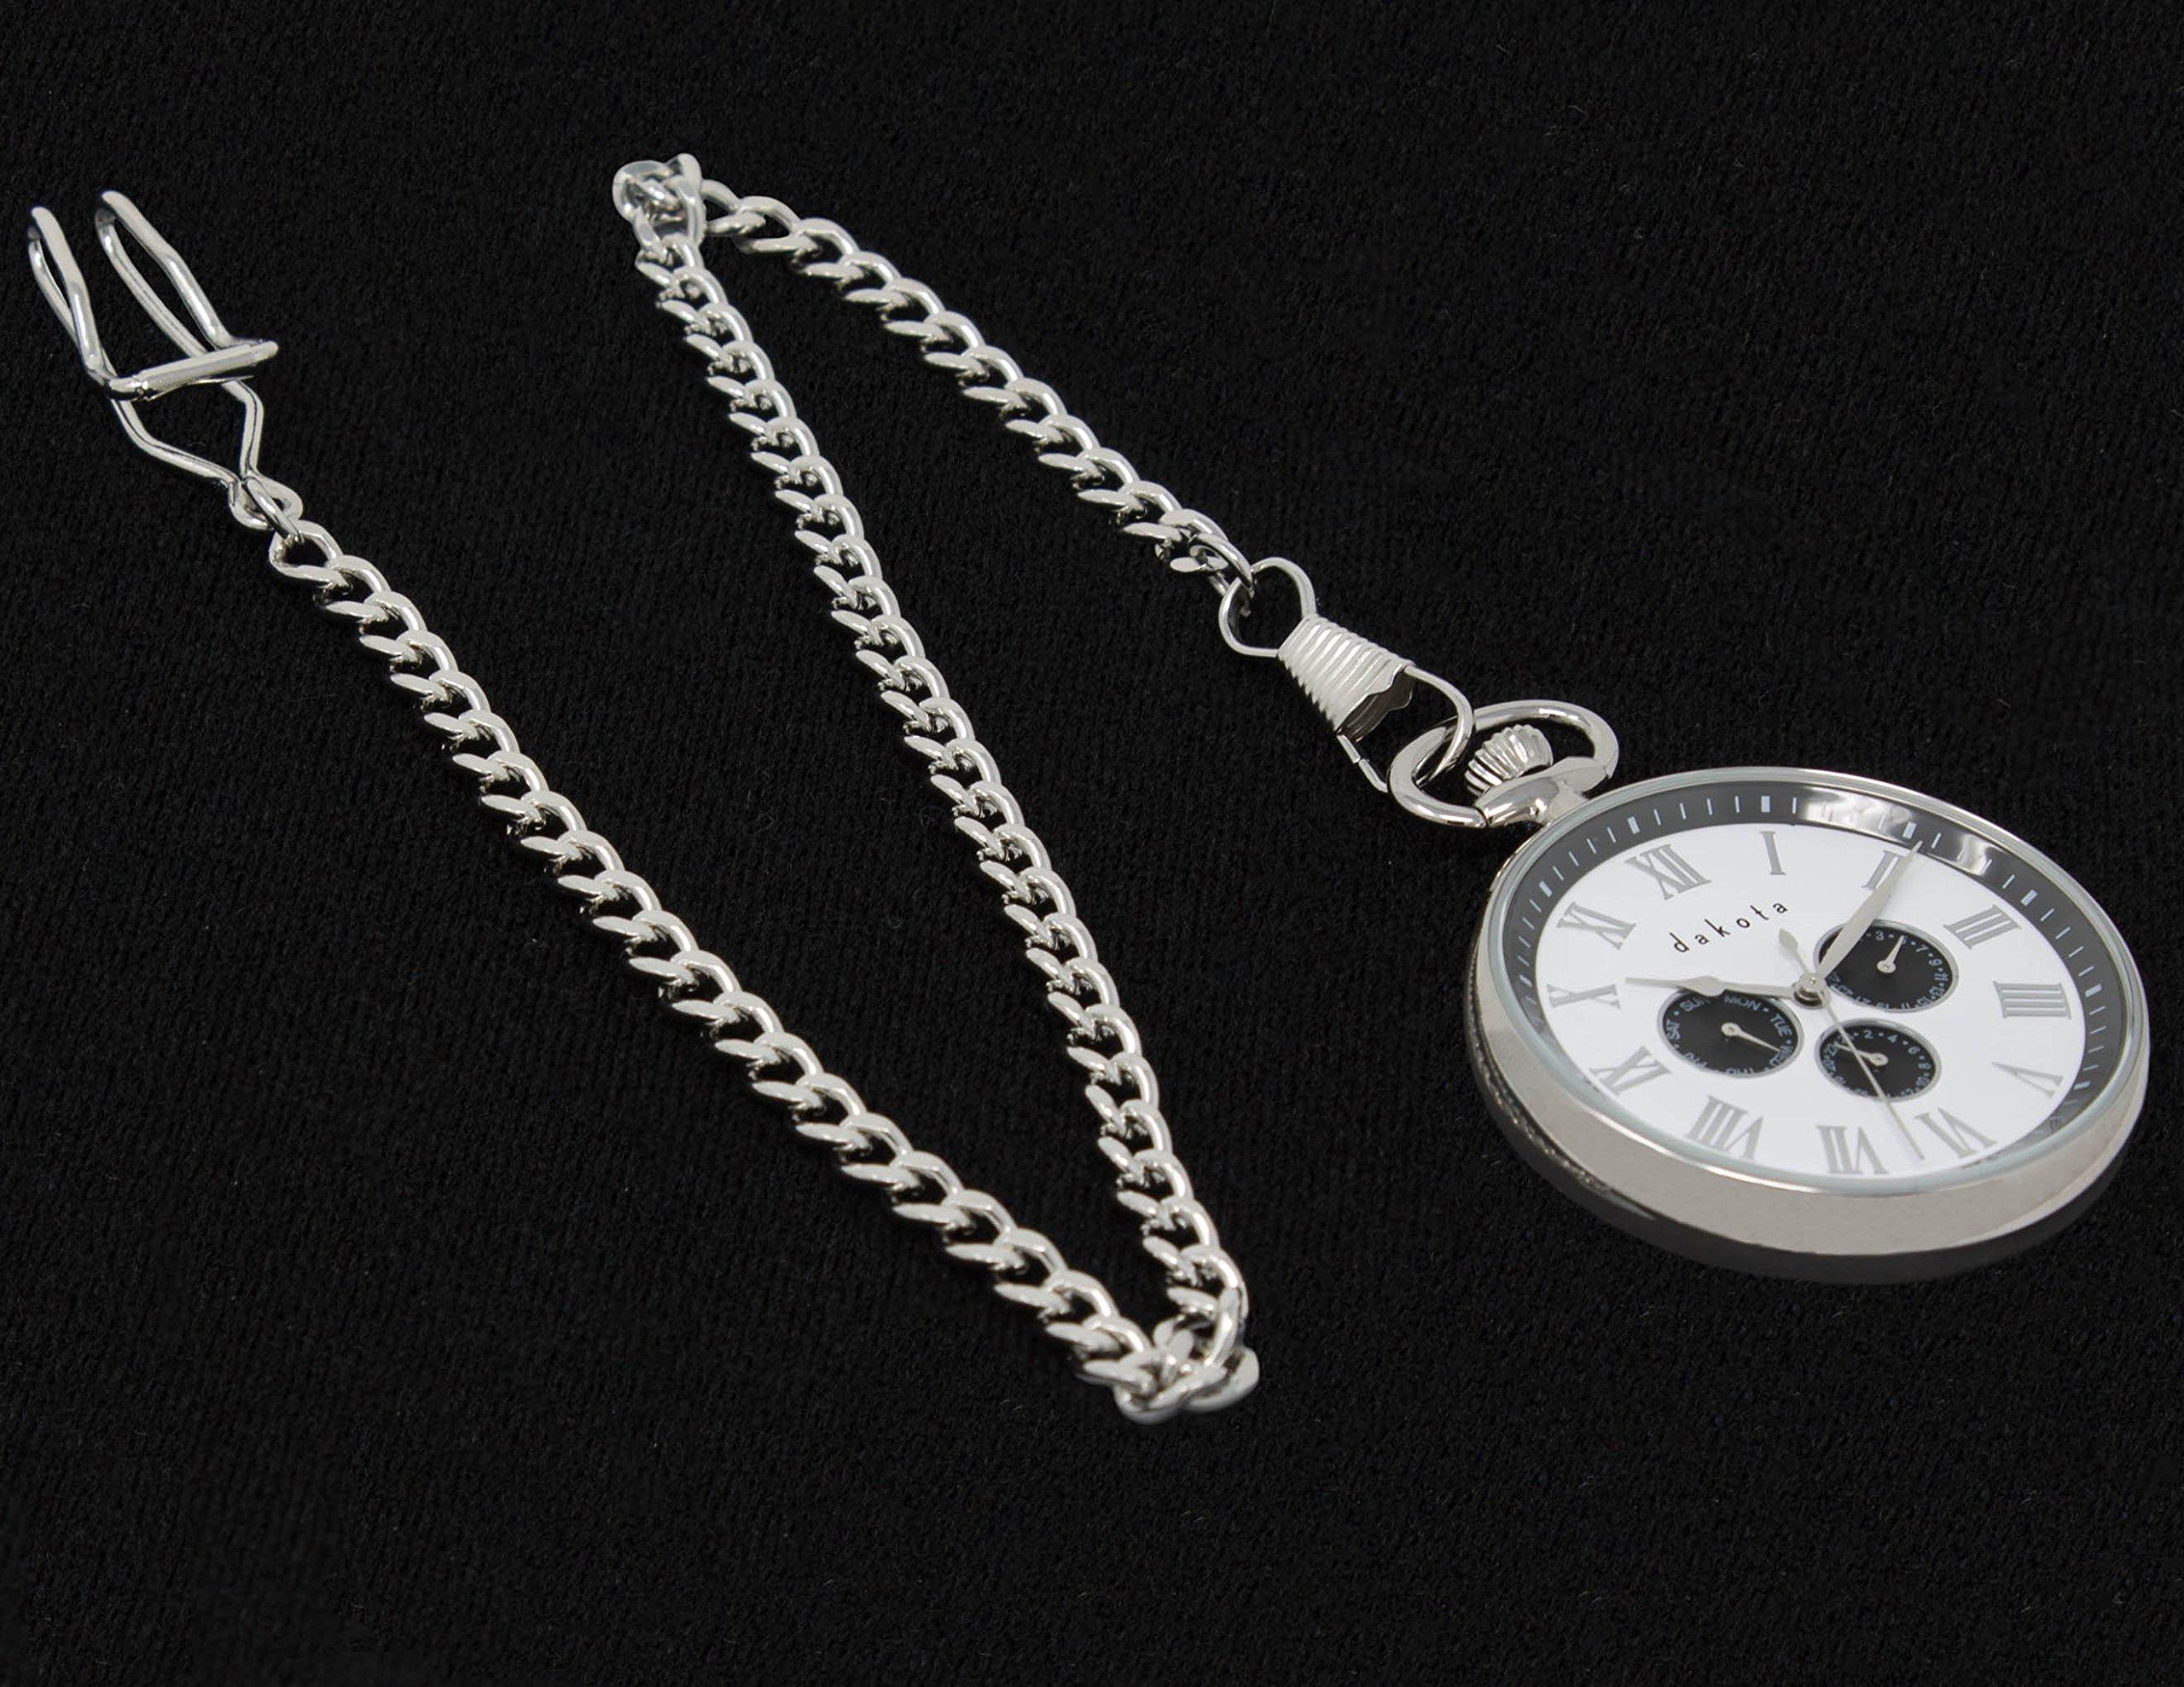 Engravable pocket watch by Dakota, Silver by Dakota (Image #3)